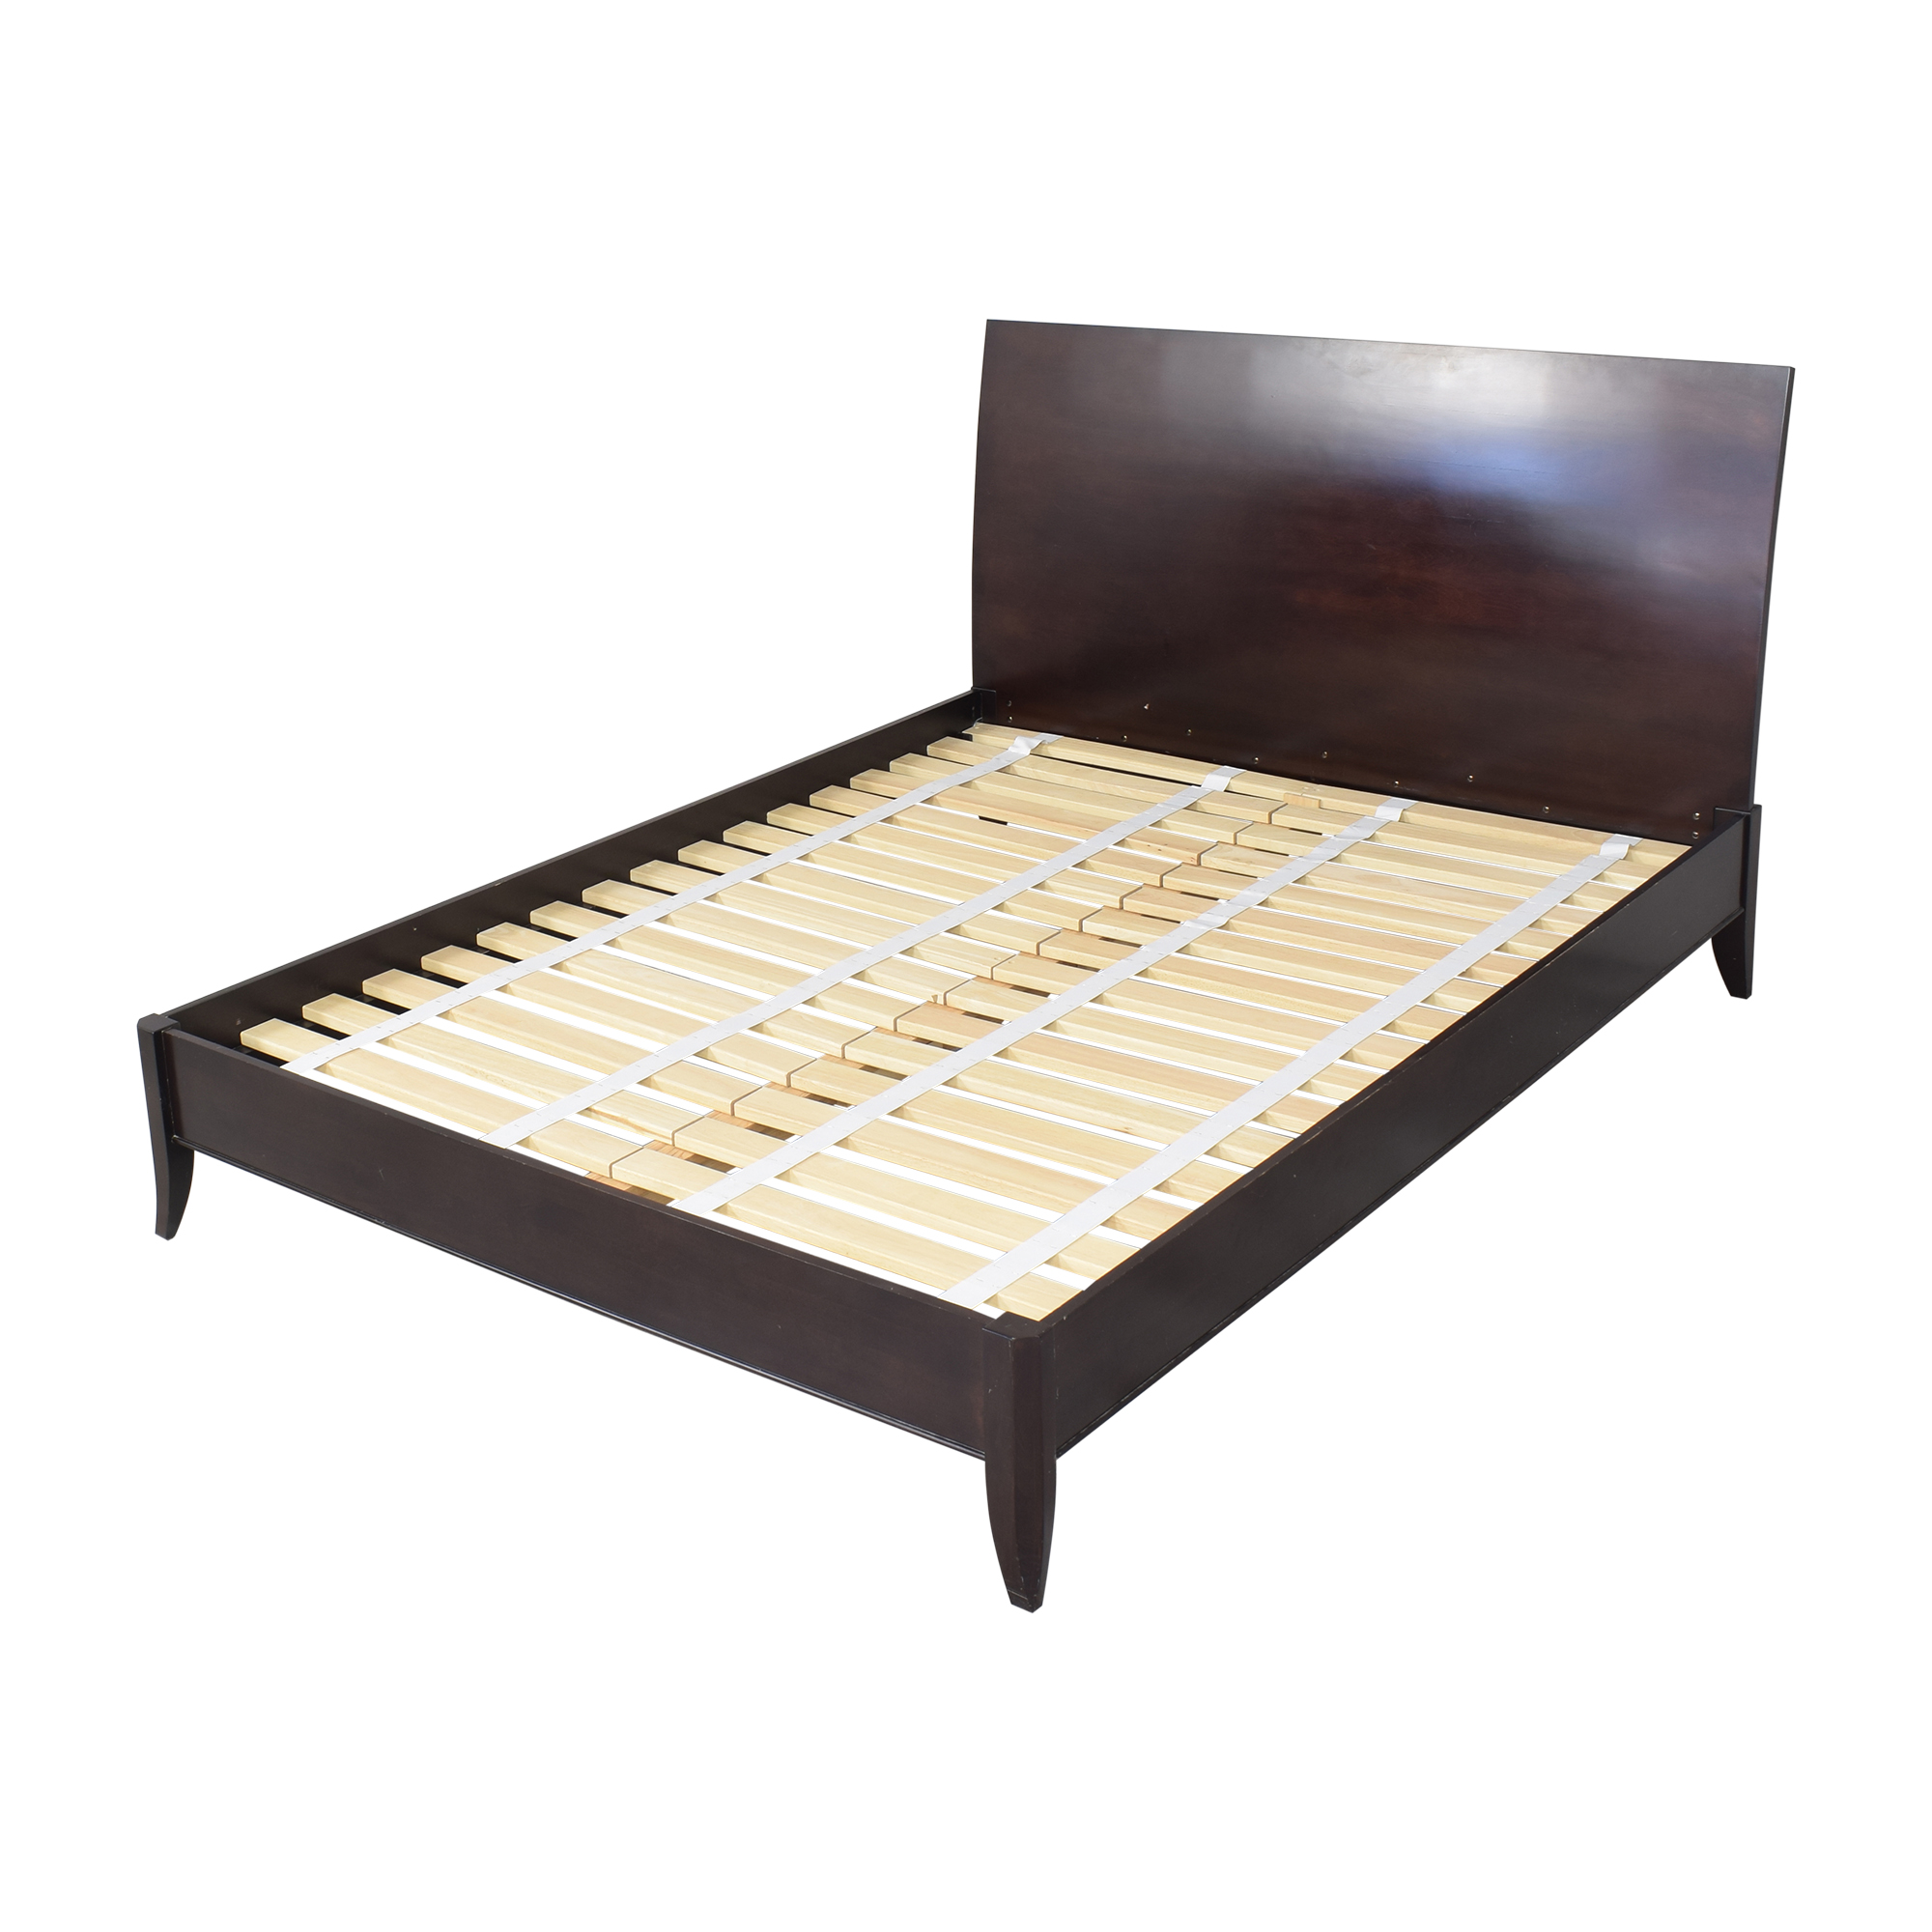 shop Crate & Barrel Crate & Barrel Queen Platform Bed online